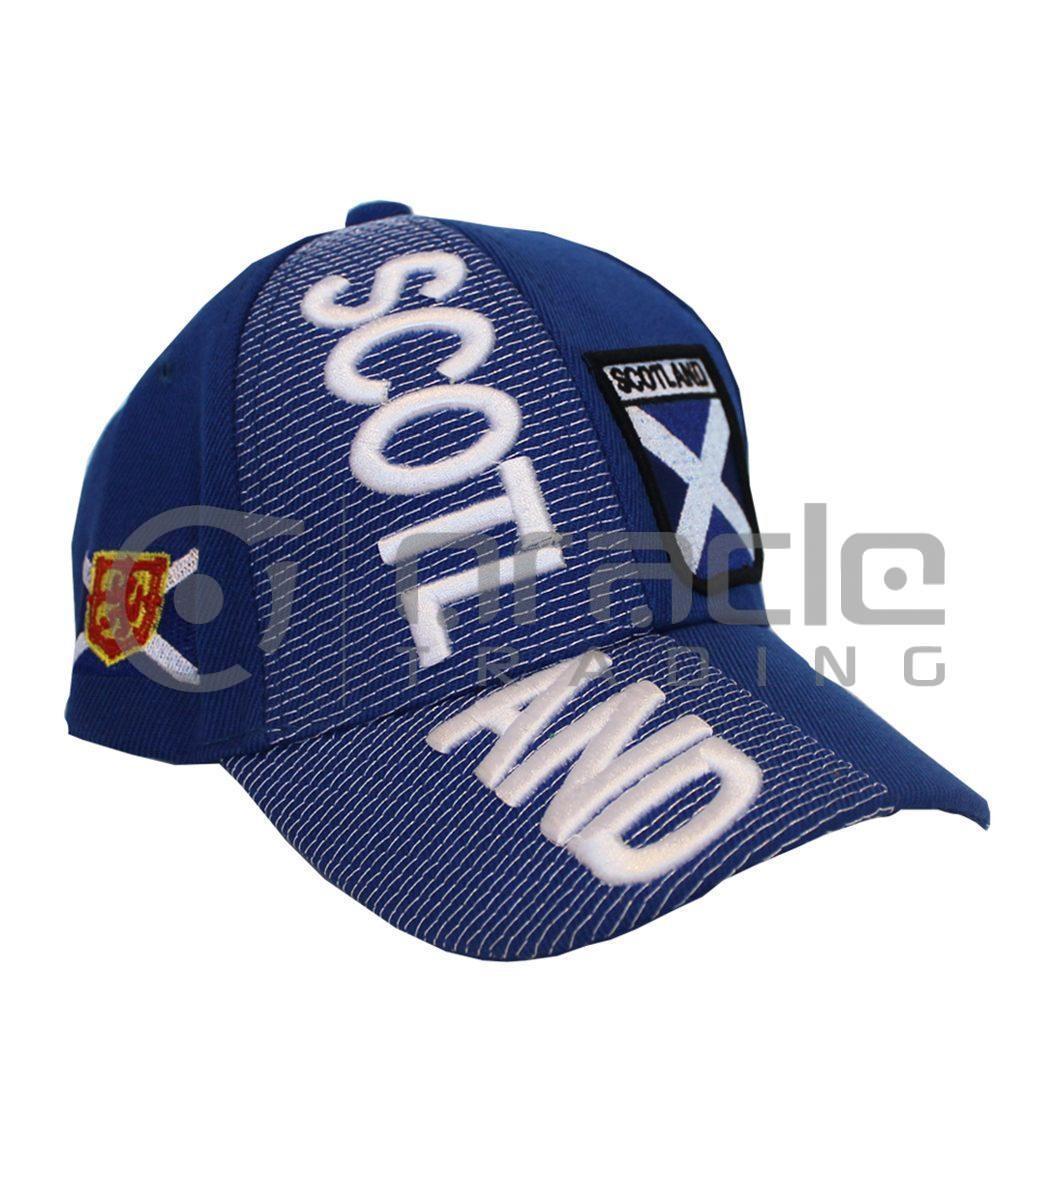 3D Scotland Hat - Kid Size